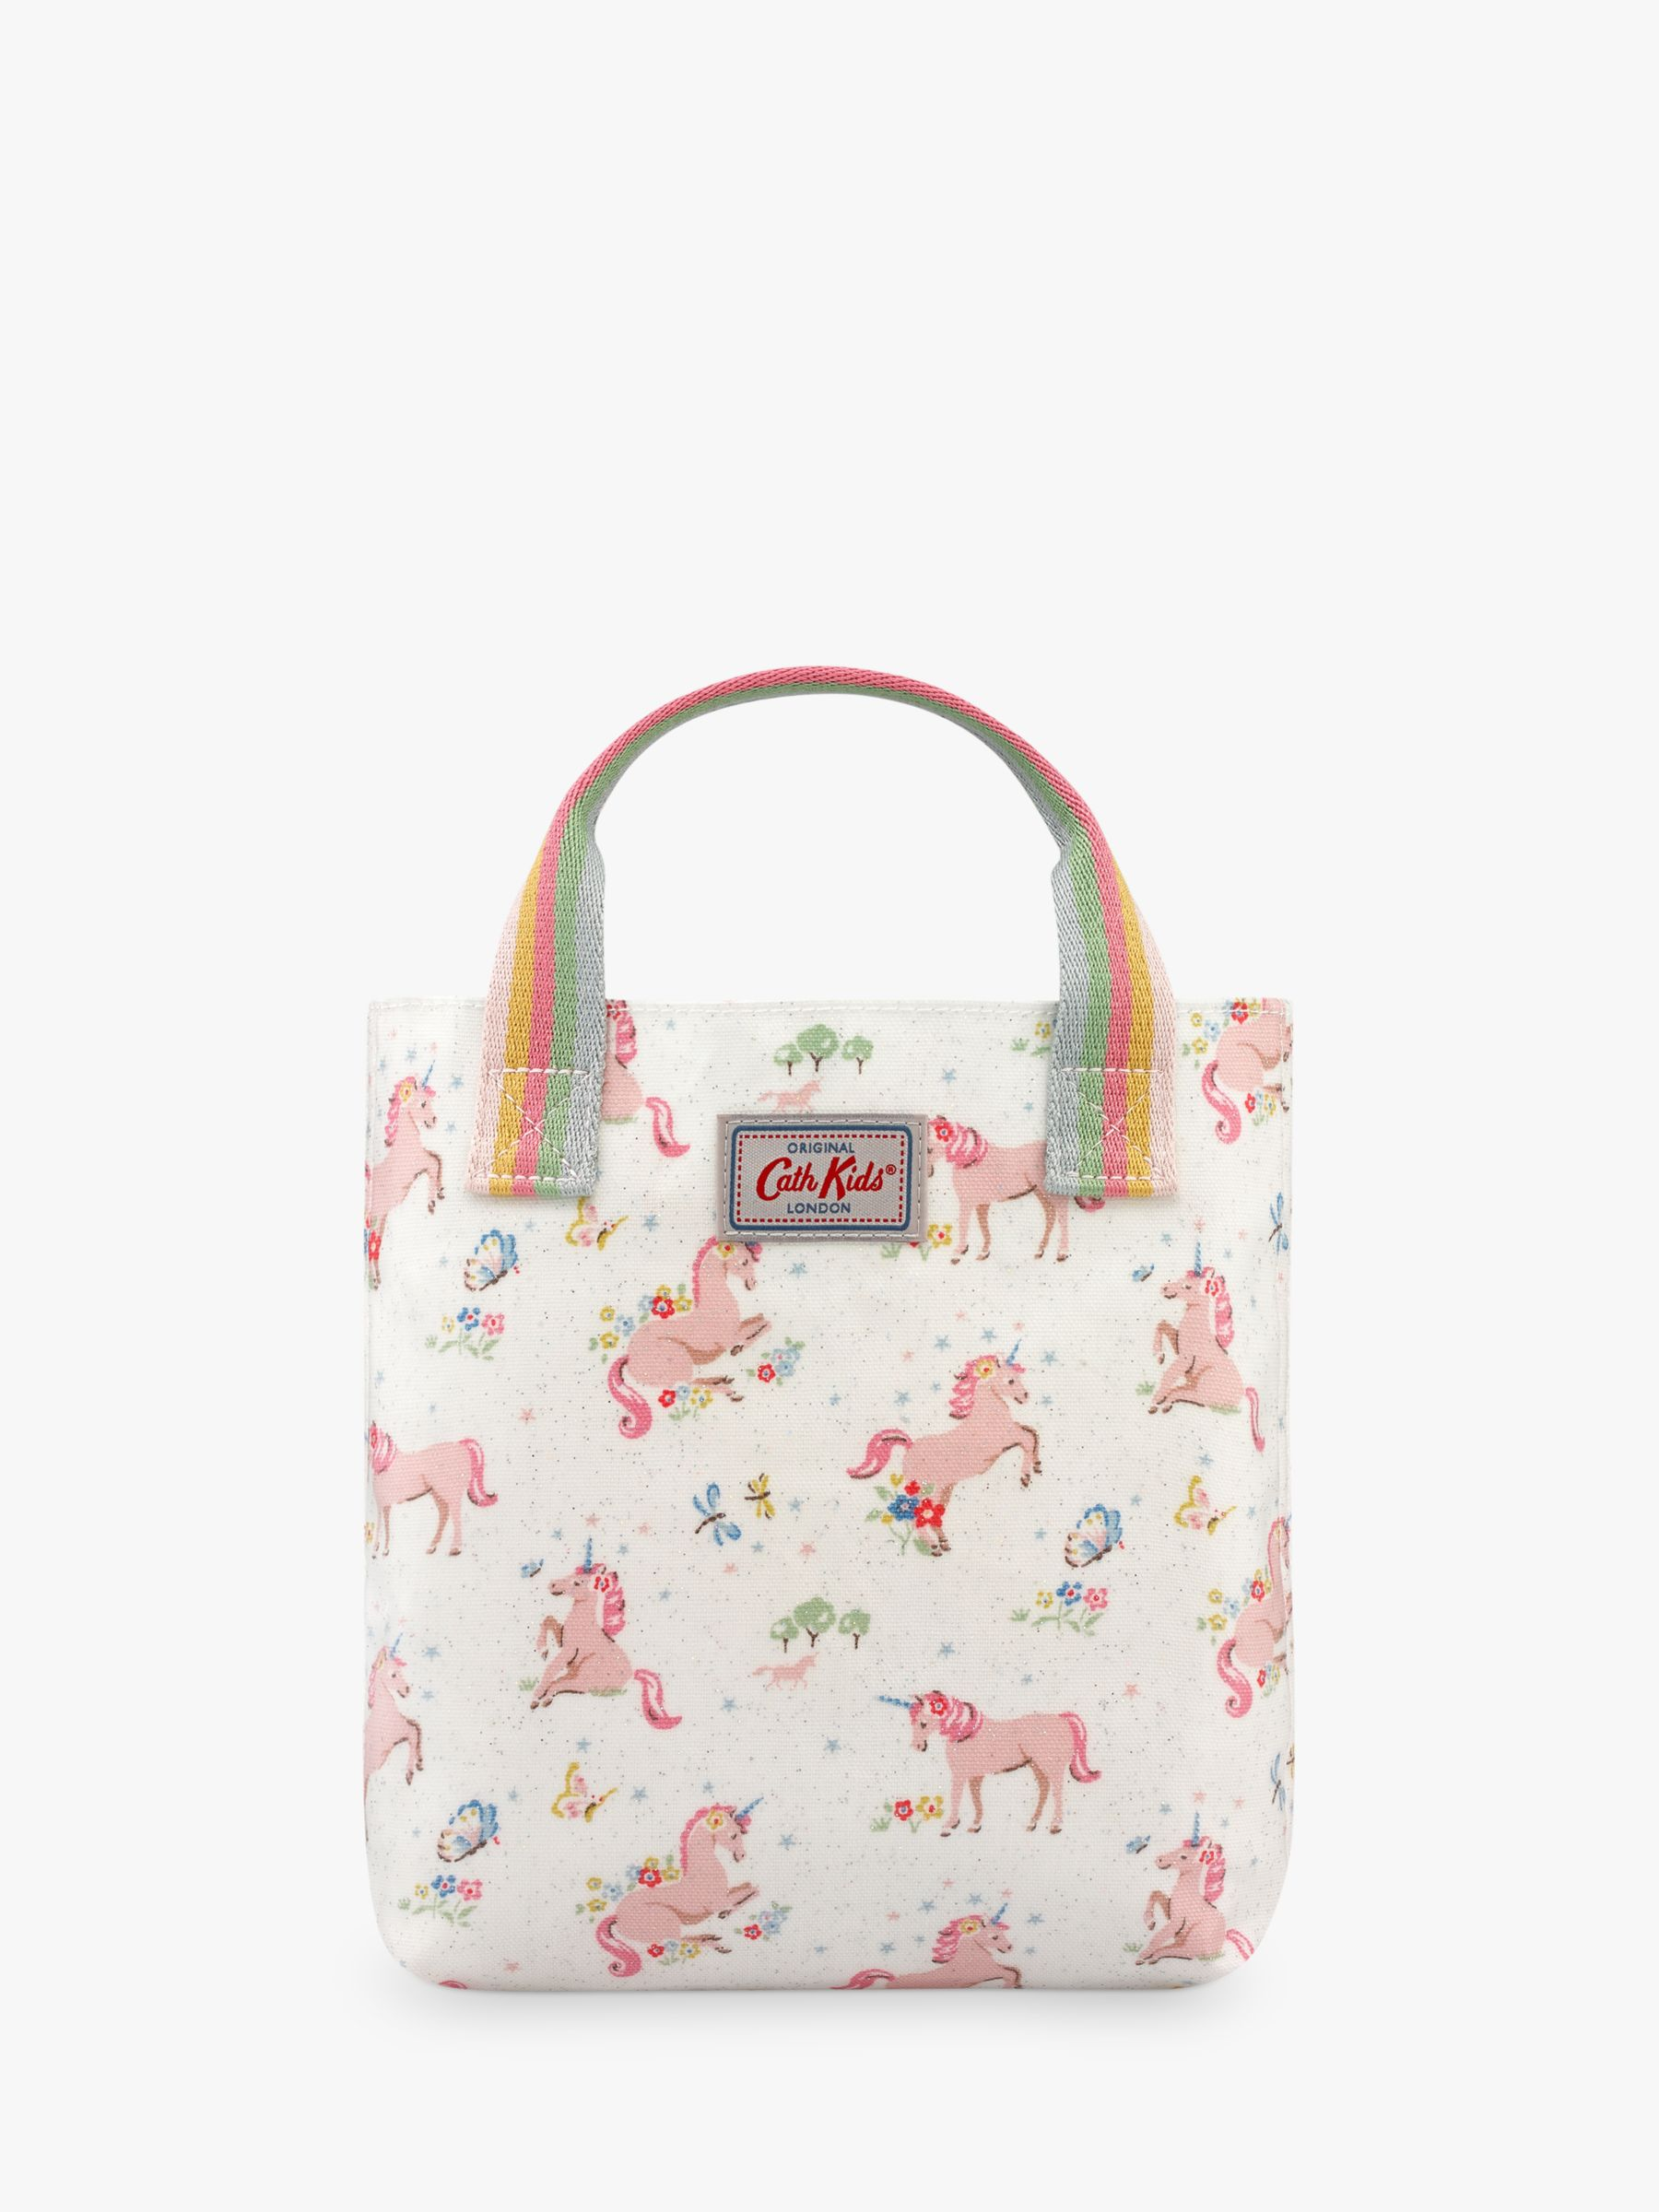 Cath Kidston Cath Kidston Kids' Mini Unicorn Meadow Shopper Bag, Cream